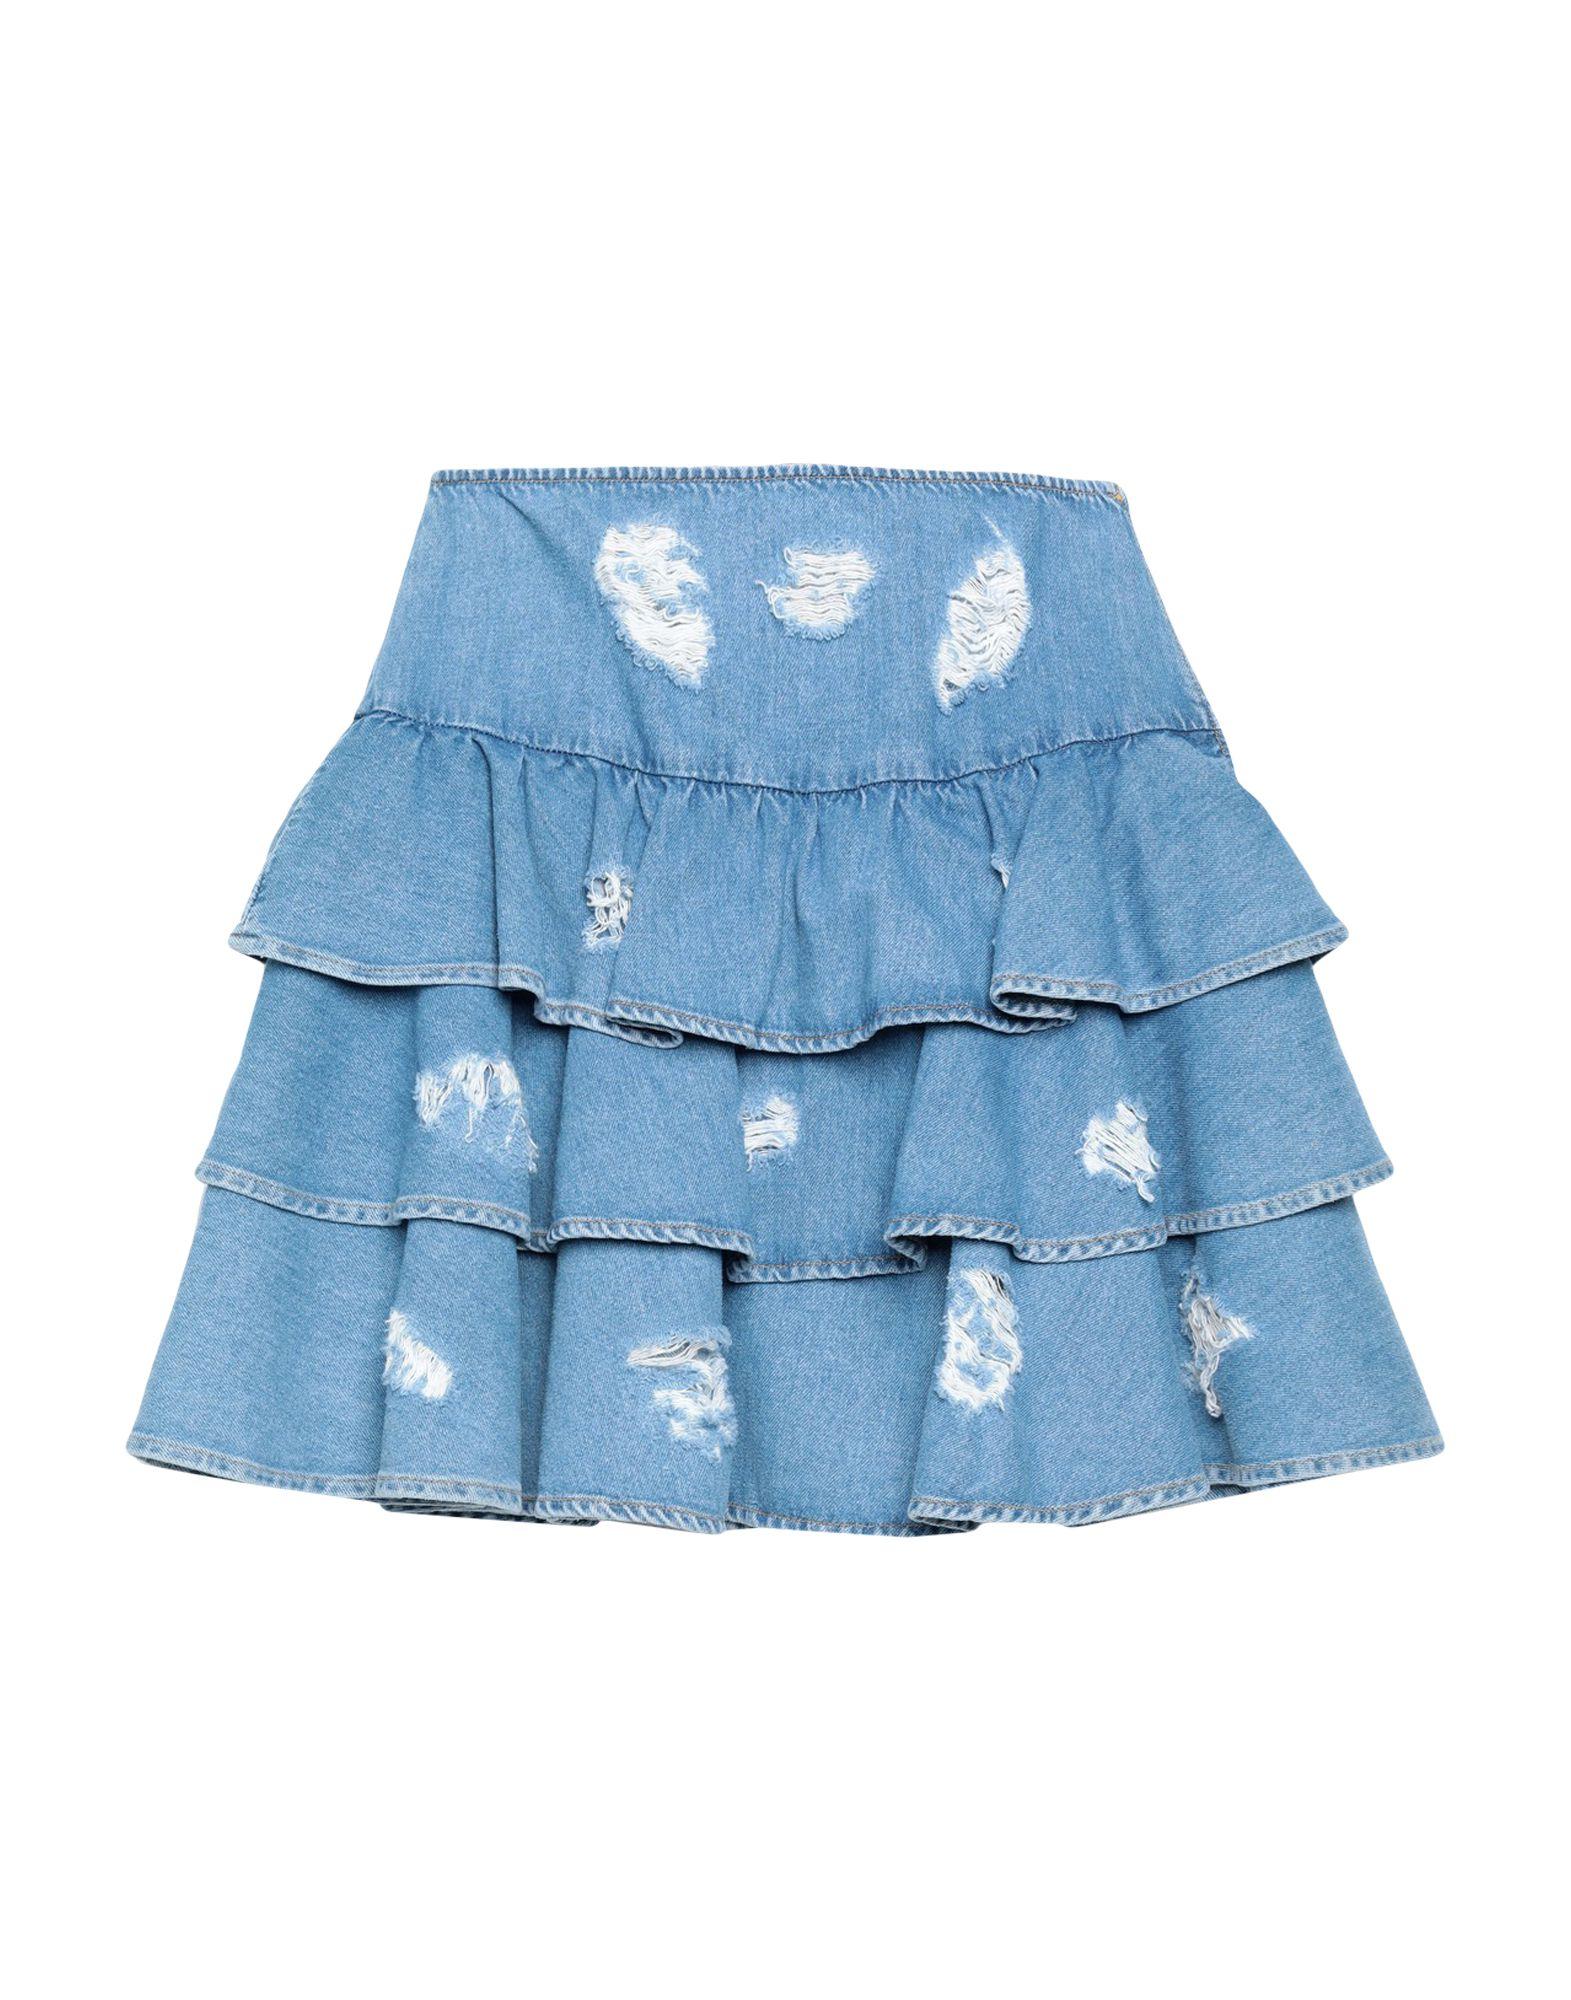 jeremy scott мини юбка JEREMY SCOTT Джинсовая юбка